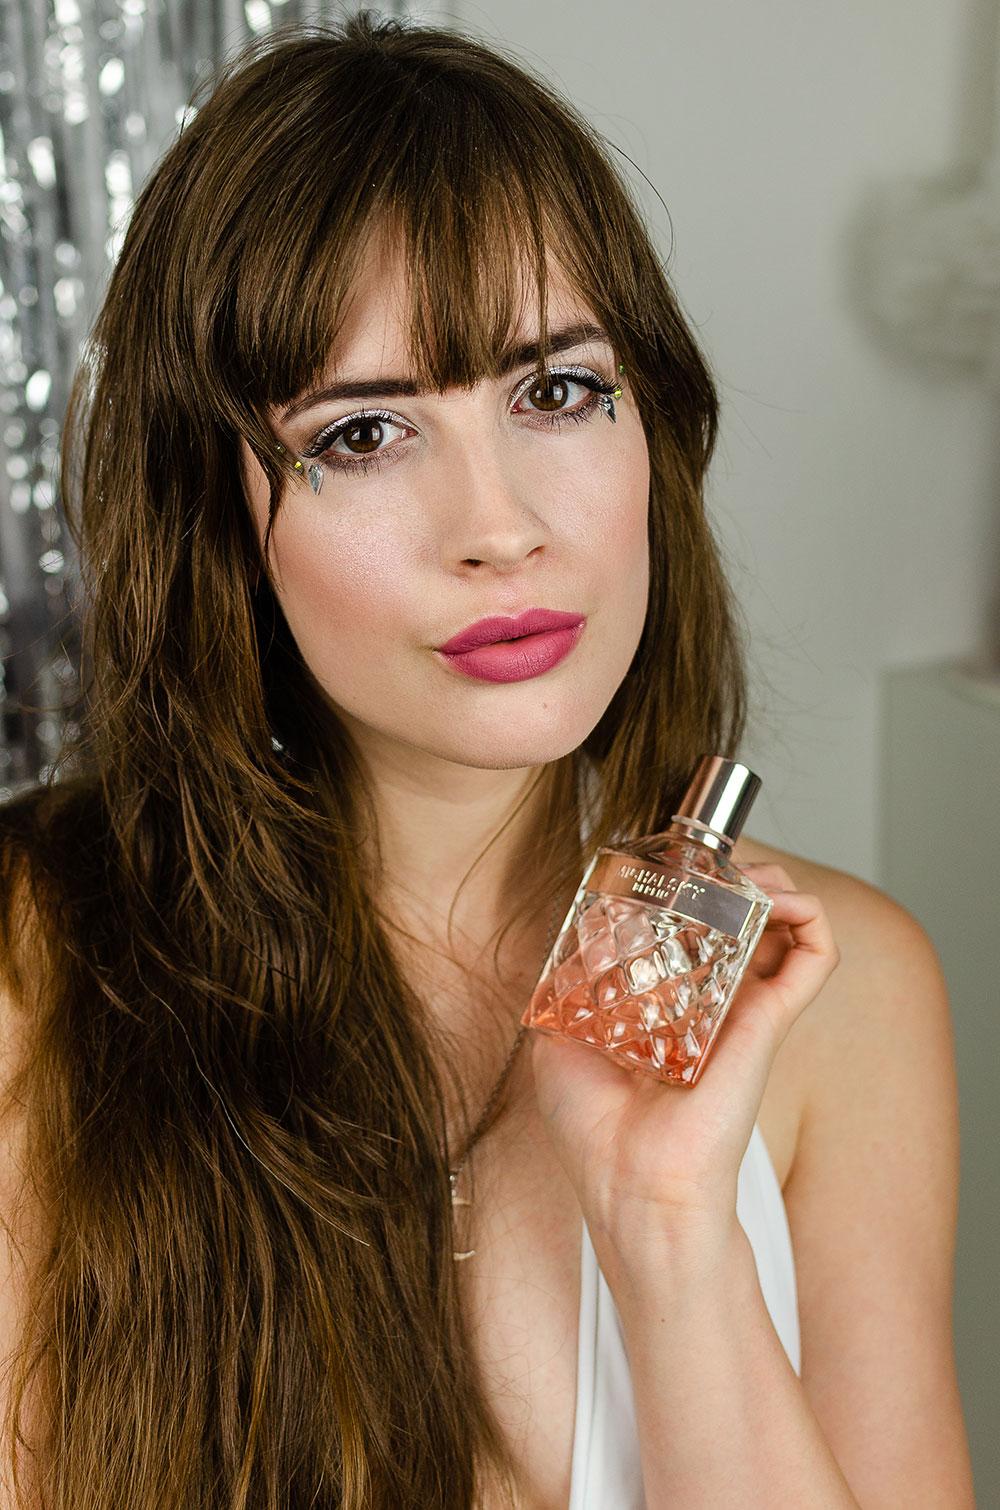 Tipps gegen spröde Lippen im Winter-Lippenstift richtig auftragen-Make-Up Beauty Hacks-Beautyblog-andysparkles